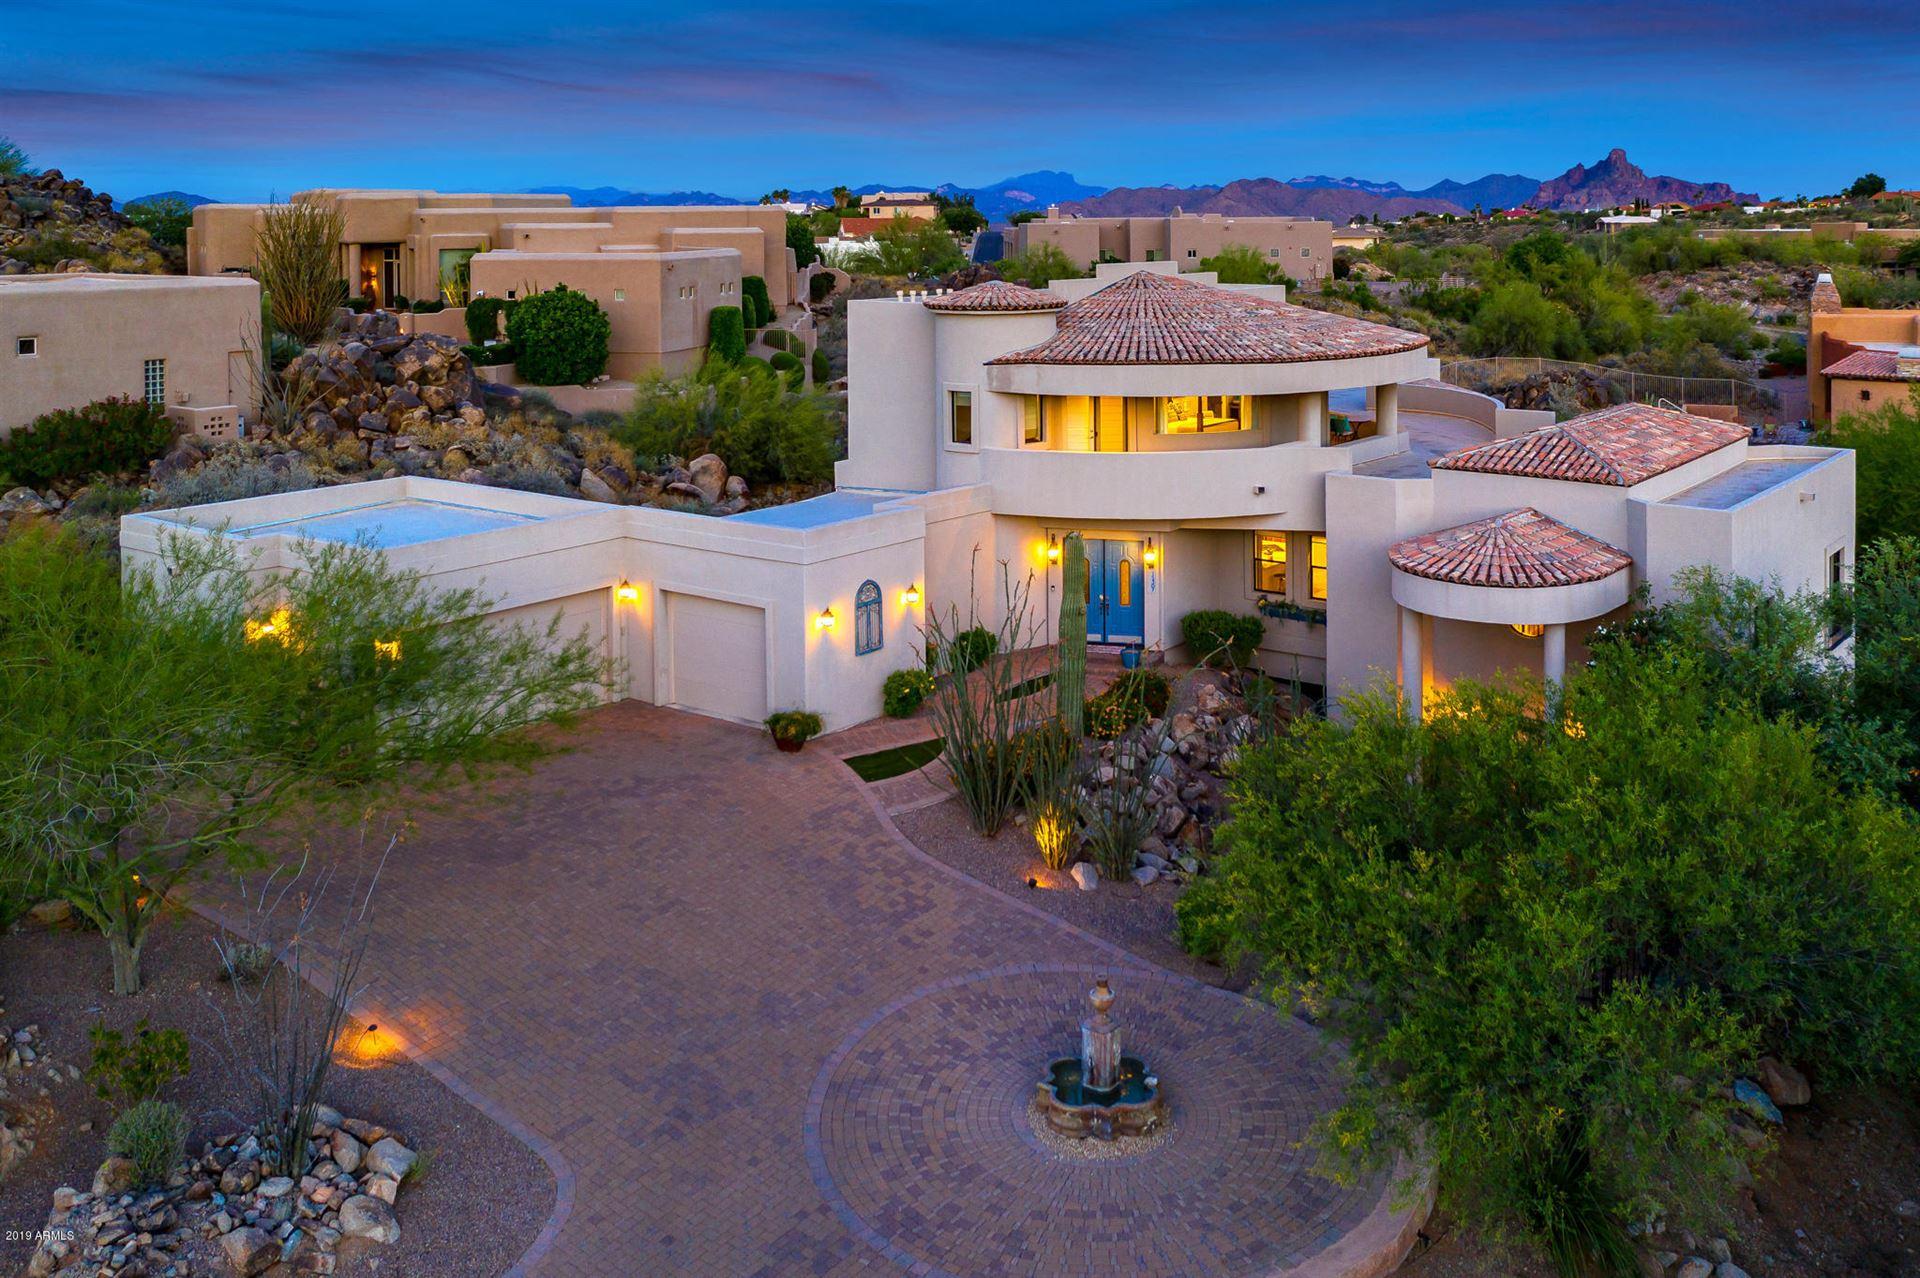 15307 E VALVERDE Drive, Fountain Hills, AZ 85268 - MLS#: 5933882